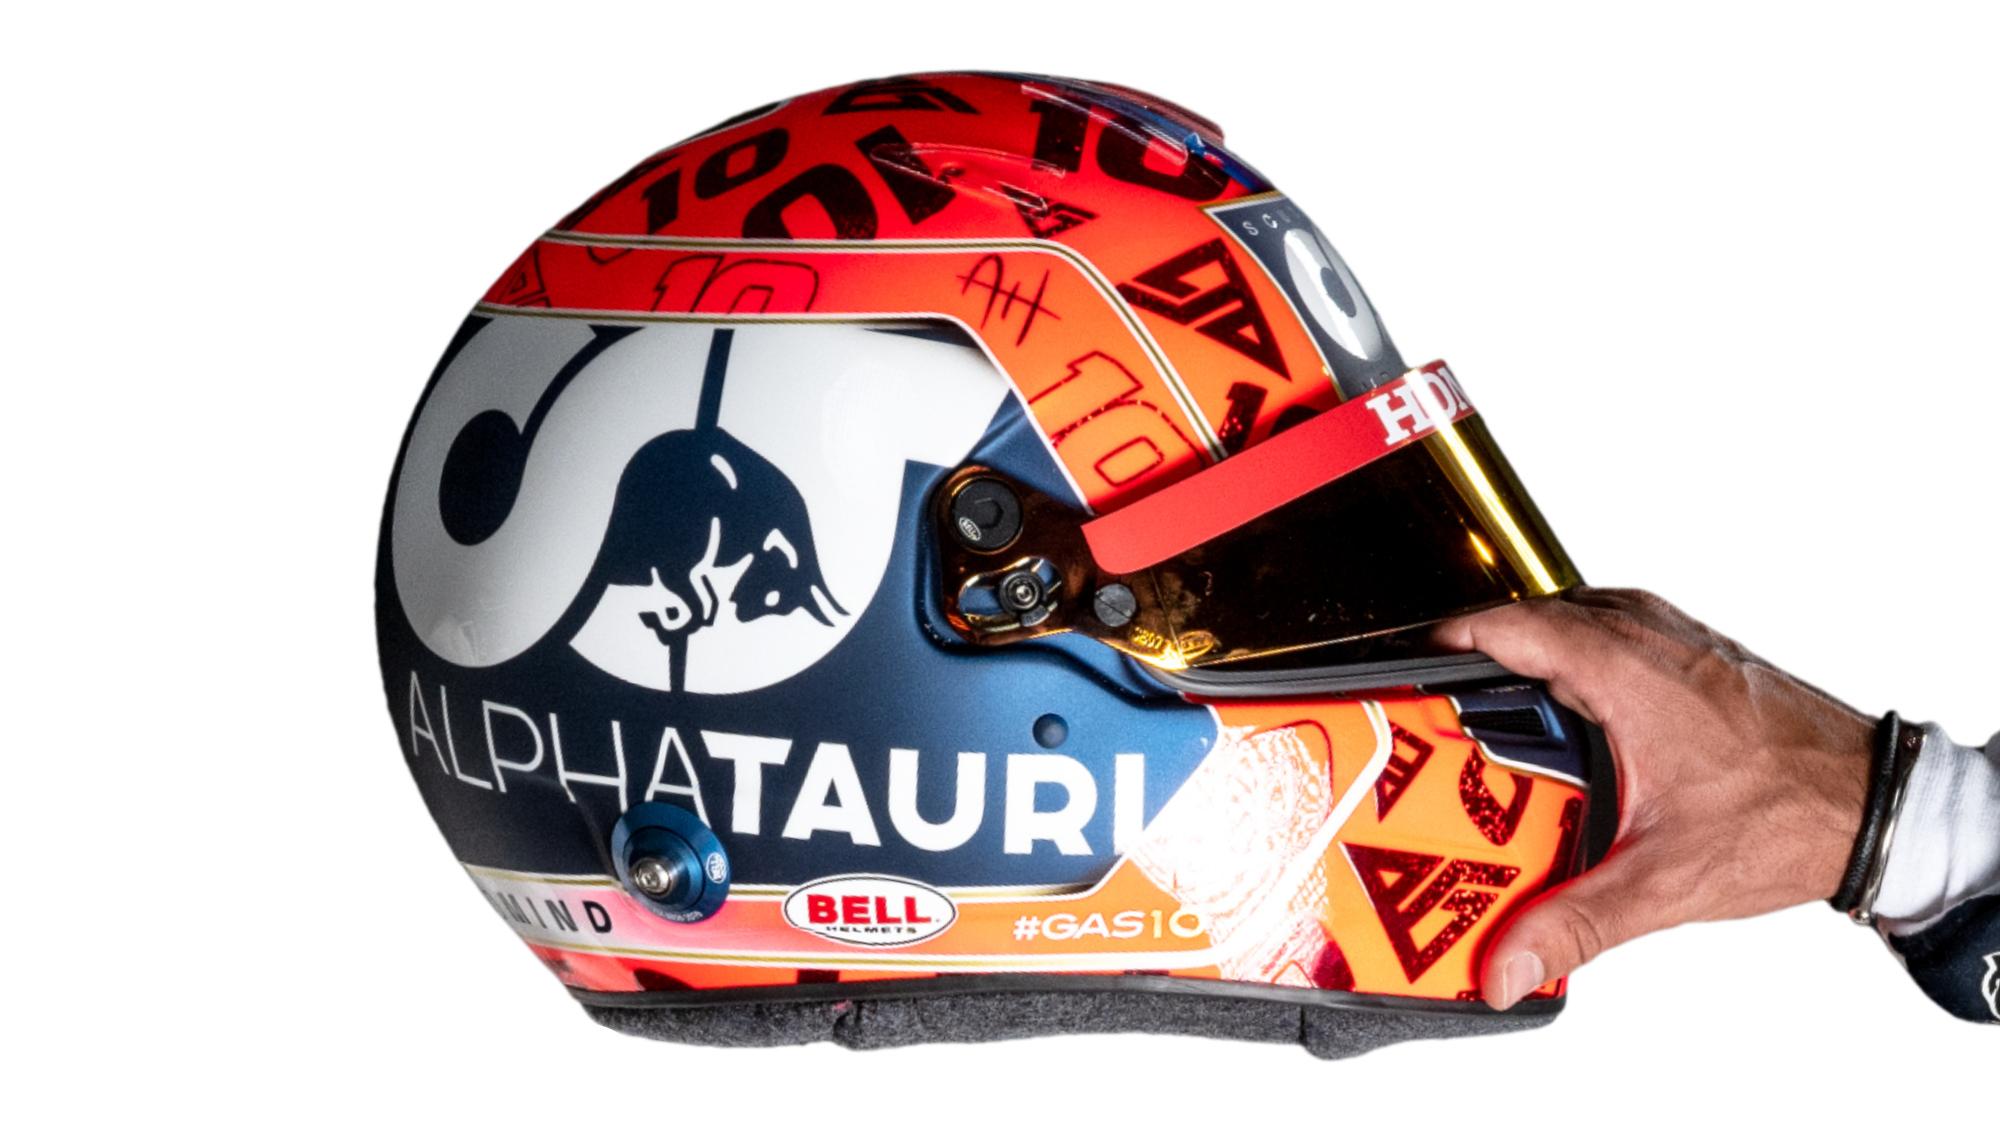 Pierre Gasly 2021 AlphaTauri helmet